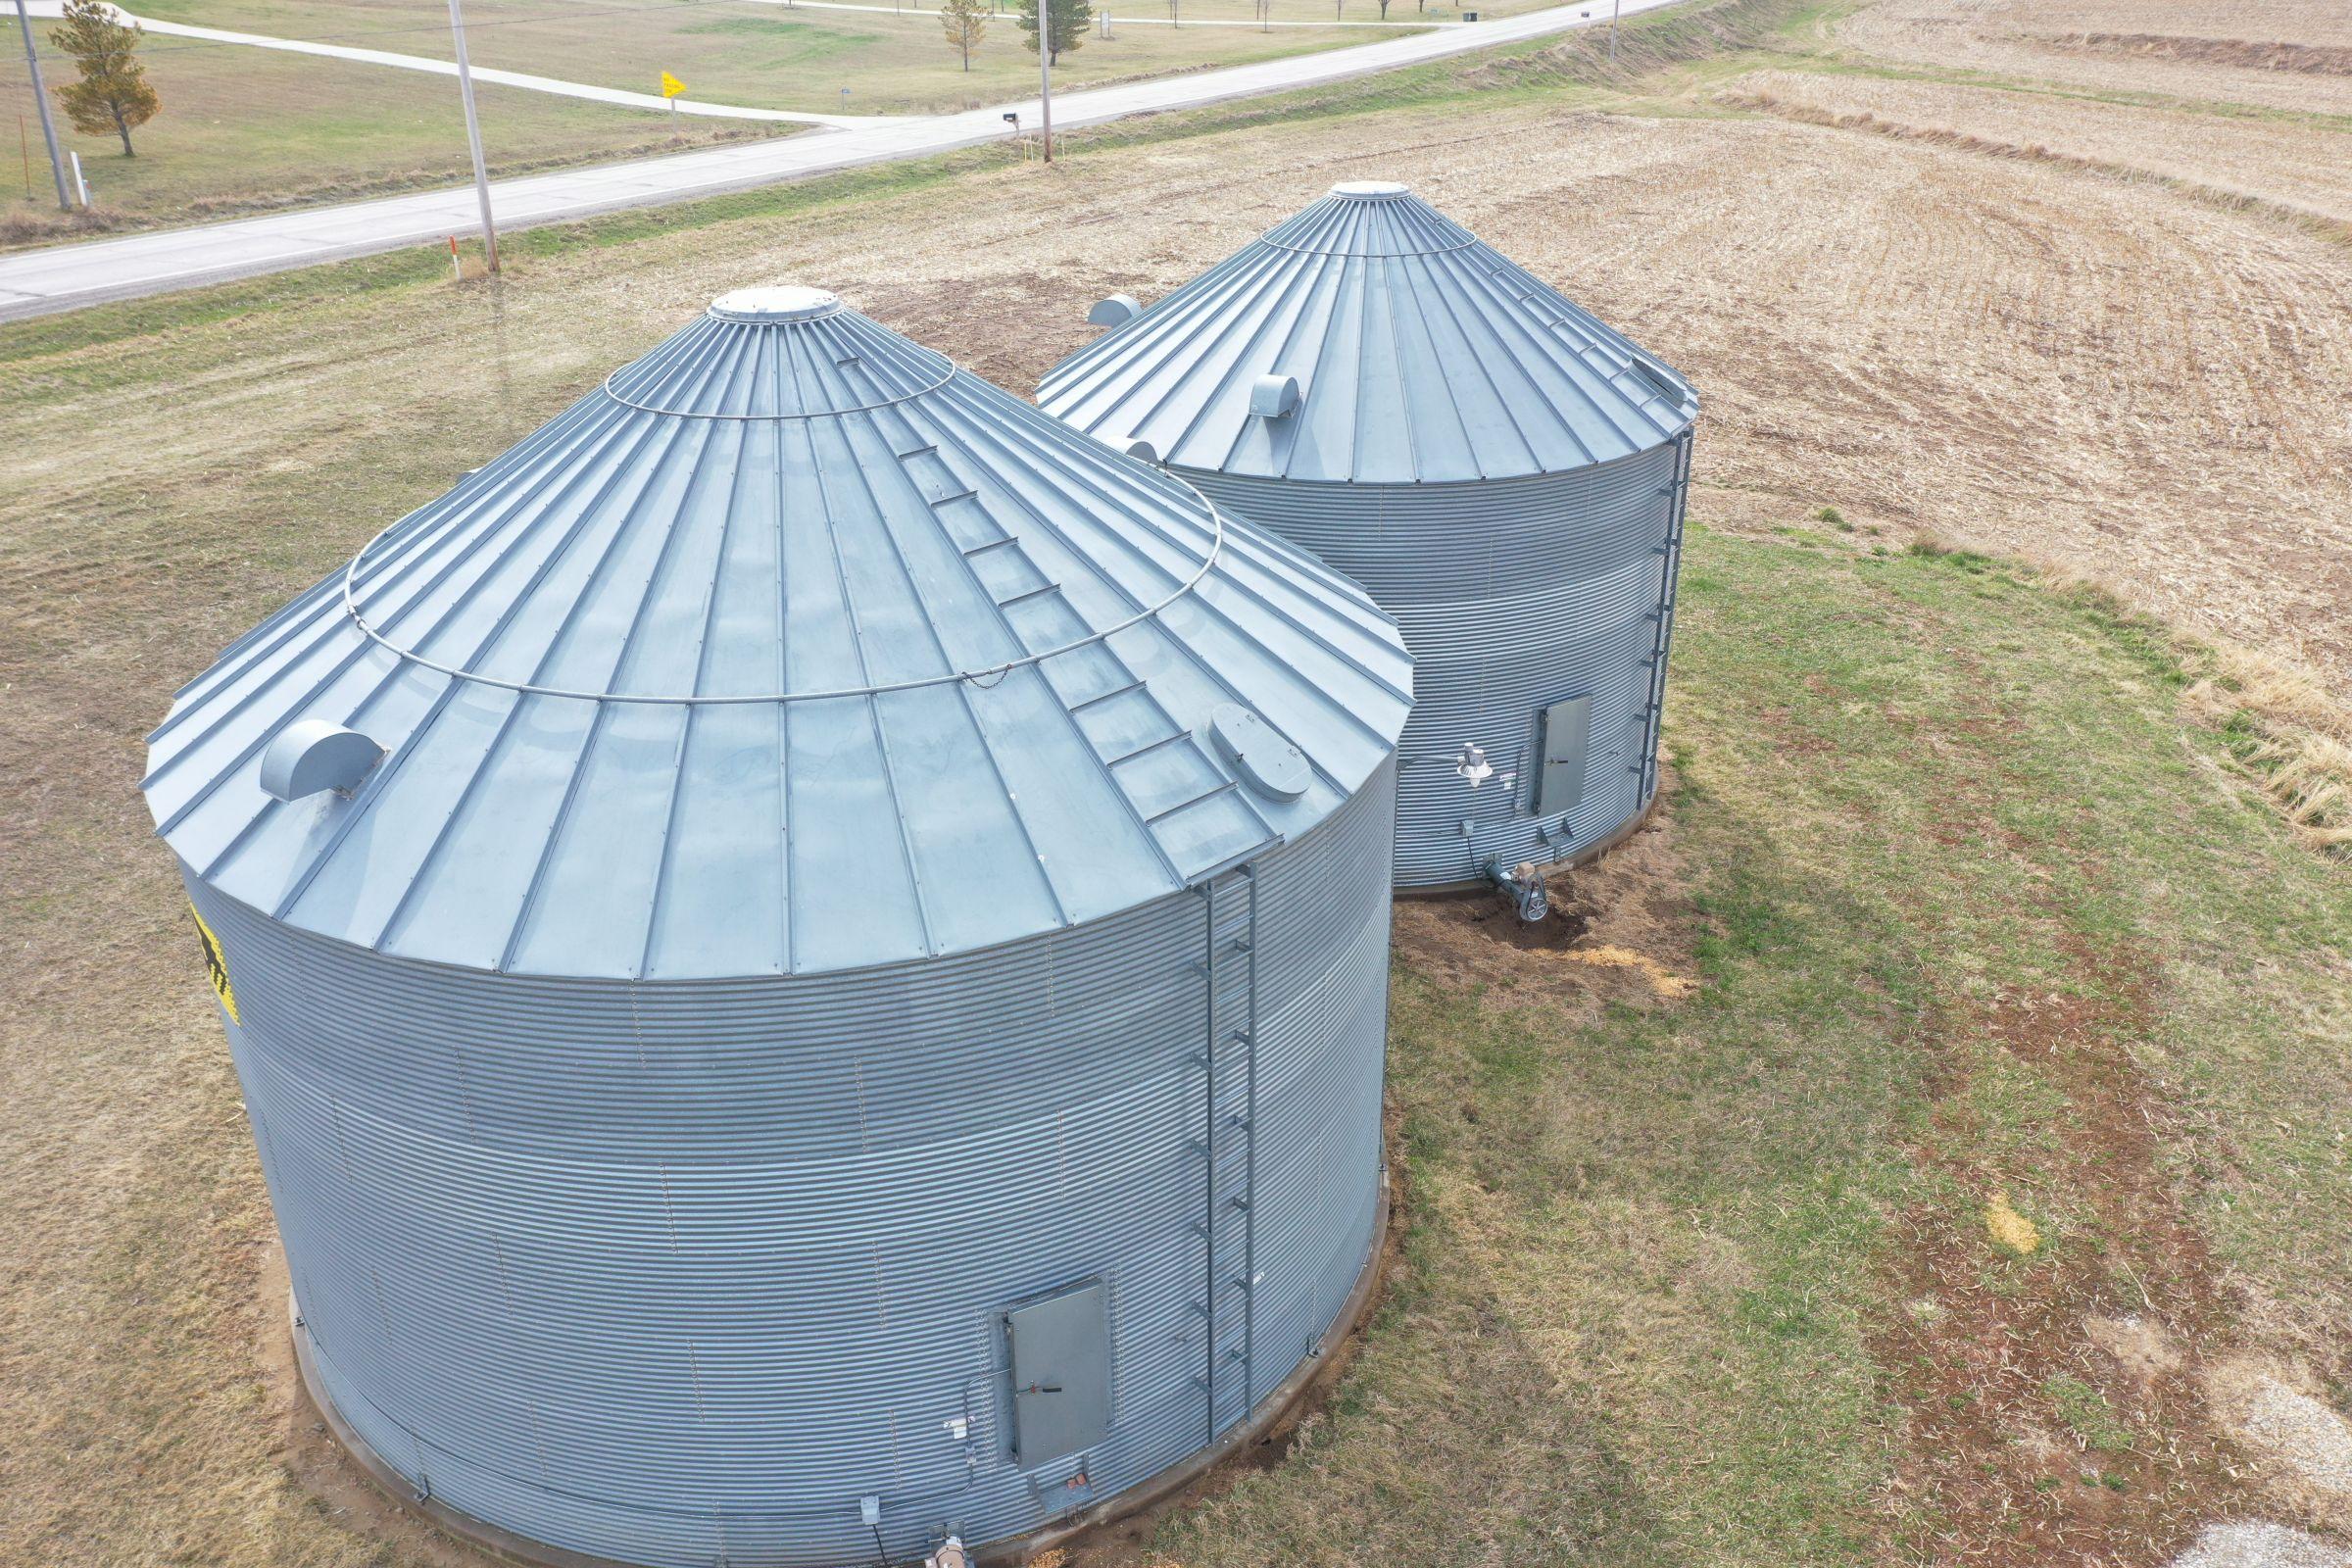 land-mills-county-iowa-284-acres-listing-number-15452-0-2021-04-12-141359.JPG